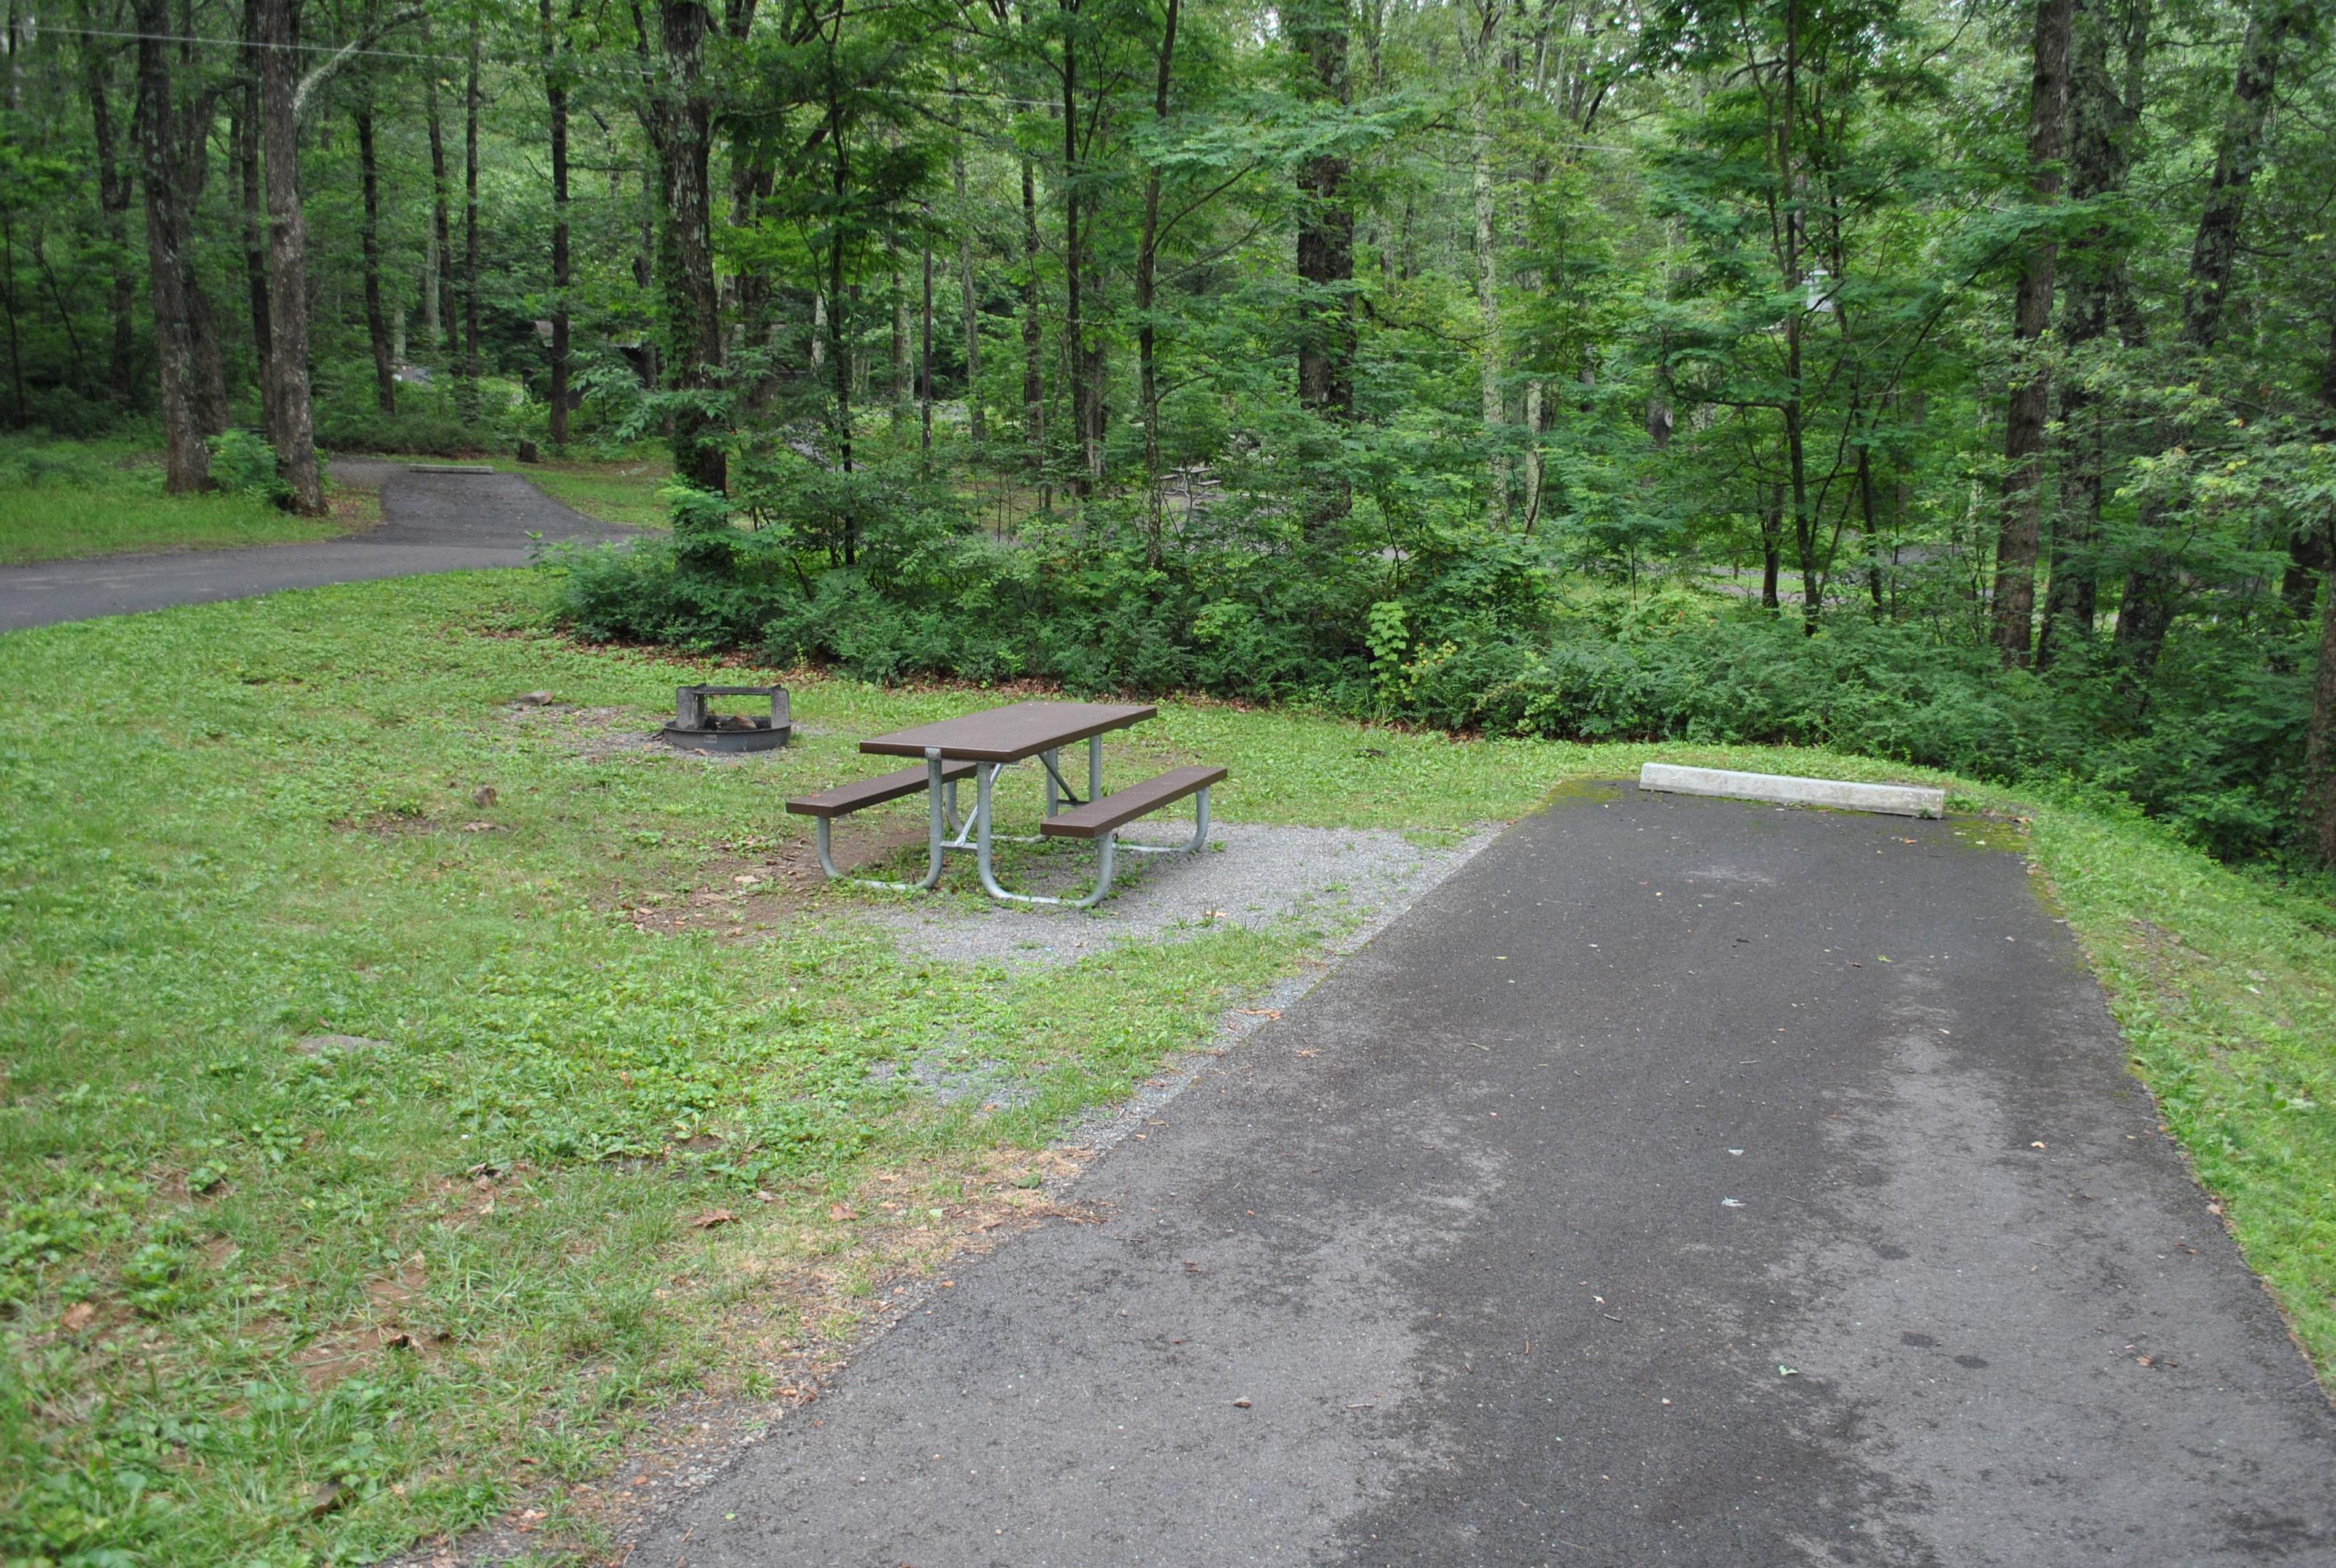 Mathews Arm Campground - Site C164